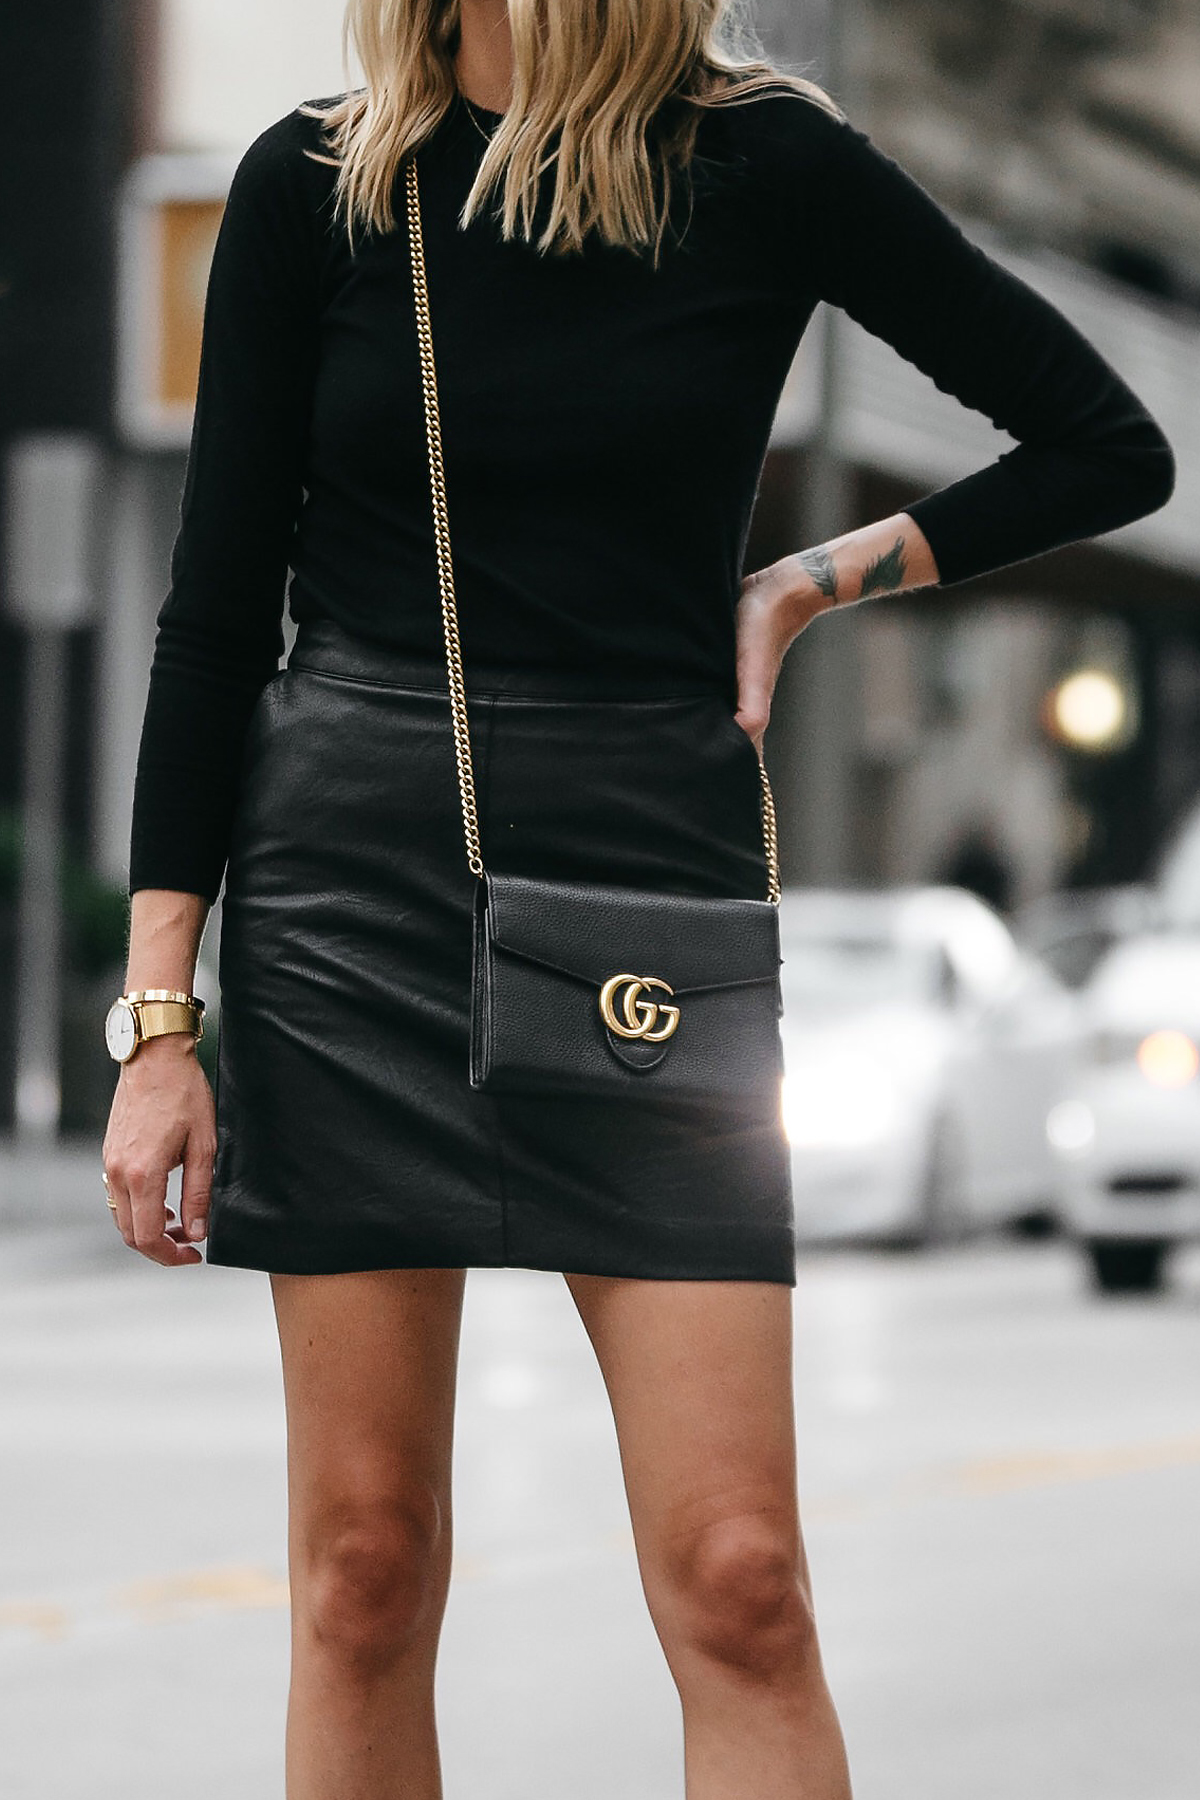 A STYLISH WAY TO WEAR A BLACK LEATHER MINI SKIRT   Fashion Jackson